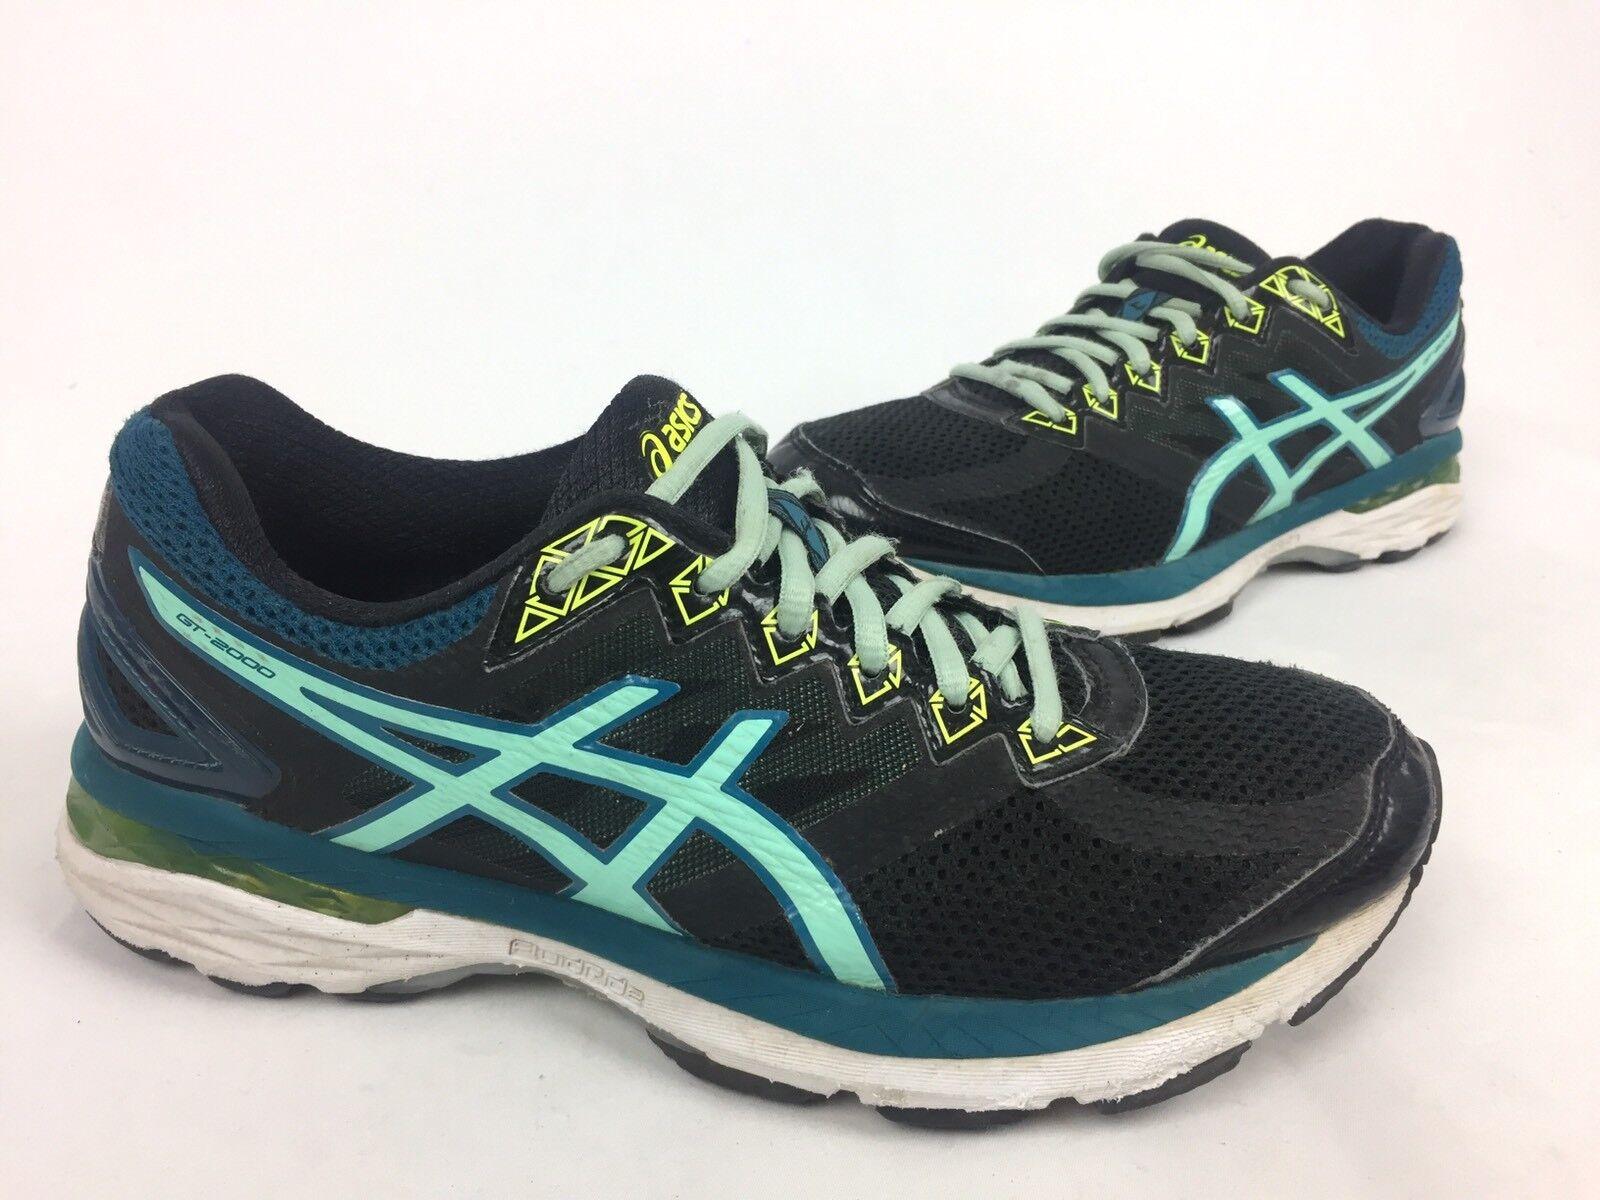 ASICS Women's GT-2000 4 Running Shoe Black/pool Blue/flash Comfortable Great discount